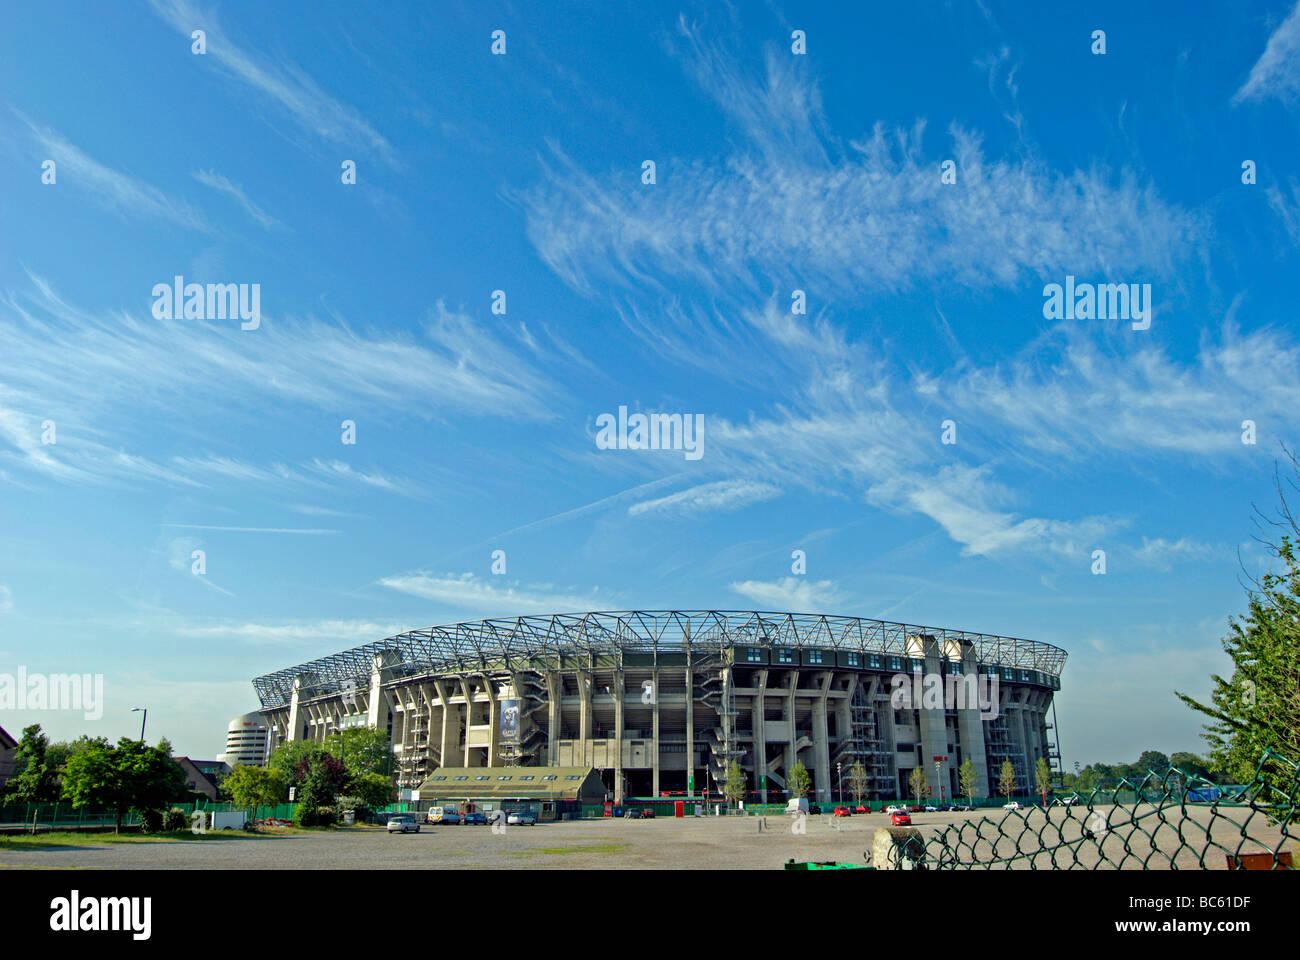 north side of twickenham stadium, or rugby ground, twickenham, middlesex, england, beneath a blue sky with high - Stock Image